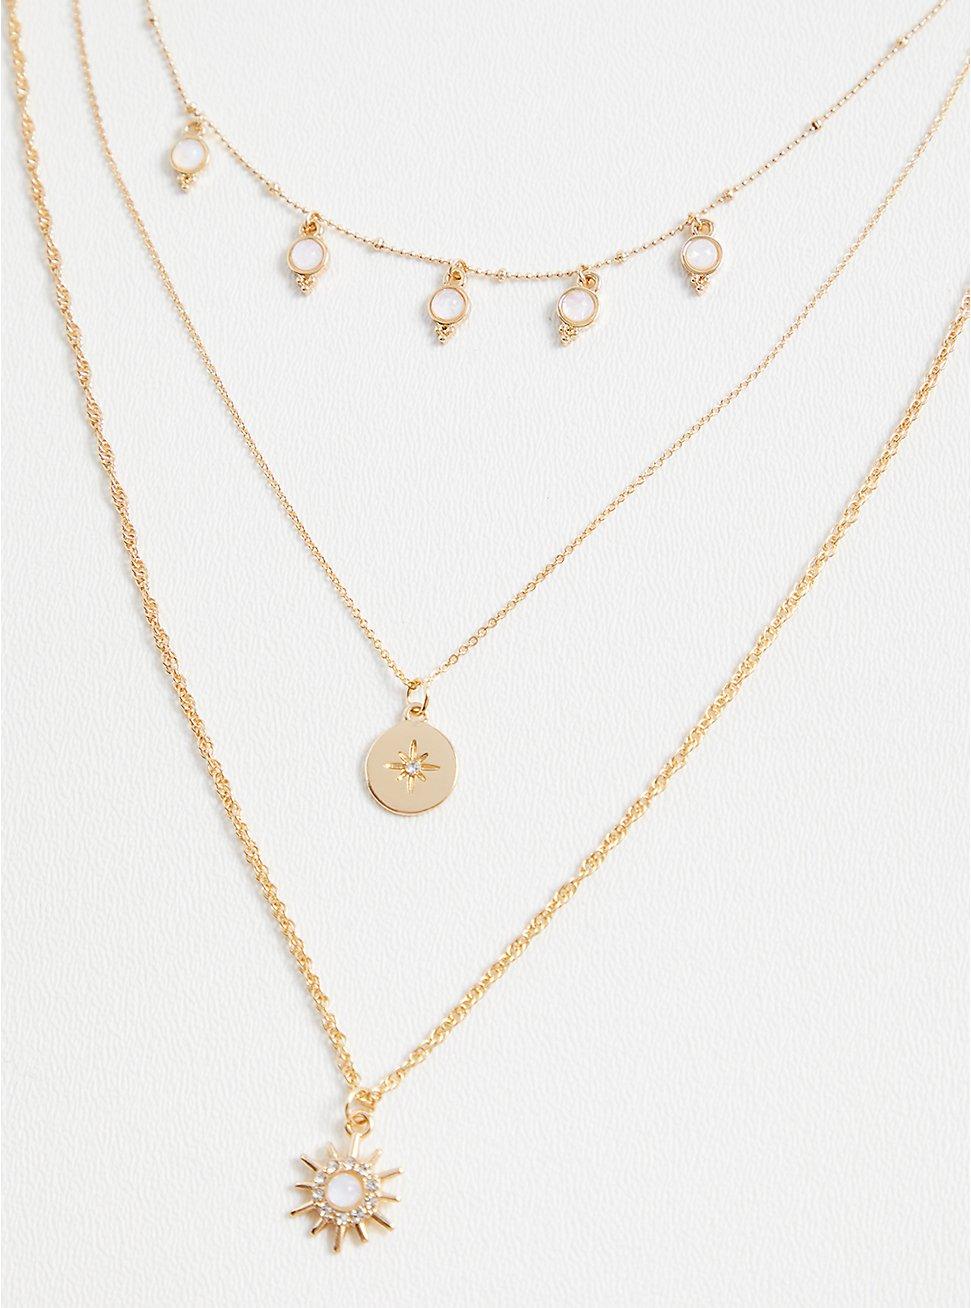 Gold-Tone Starburst Layered Necklace, , hi-res